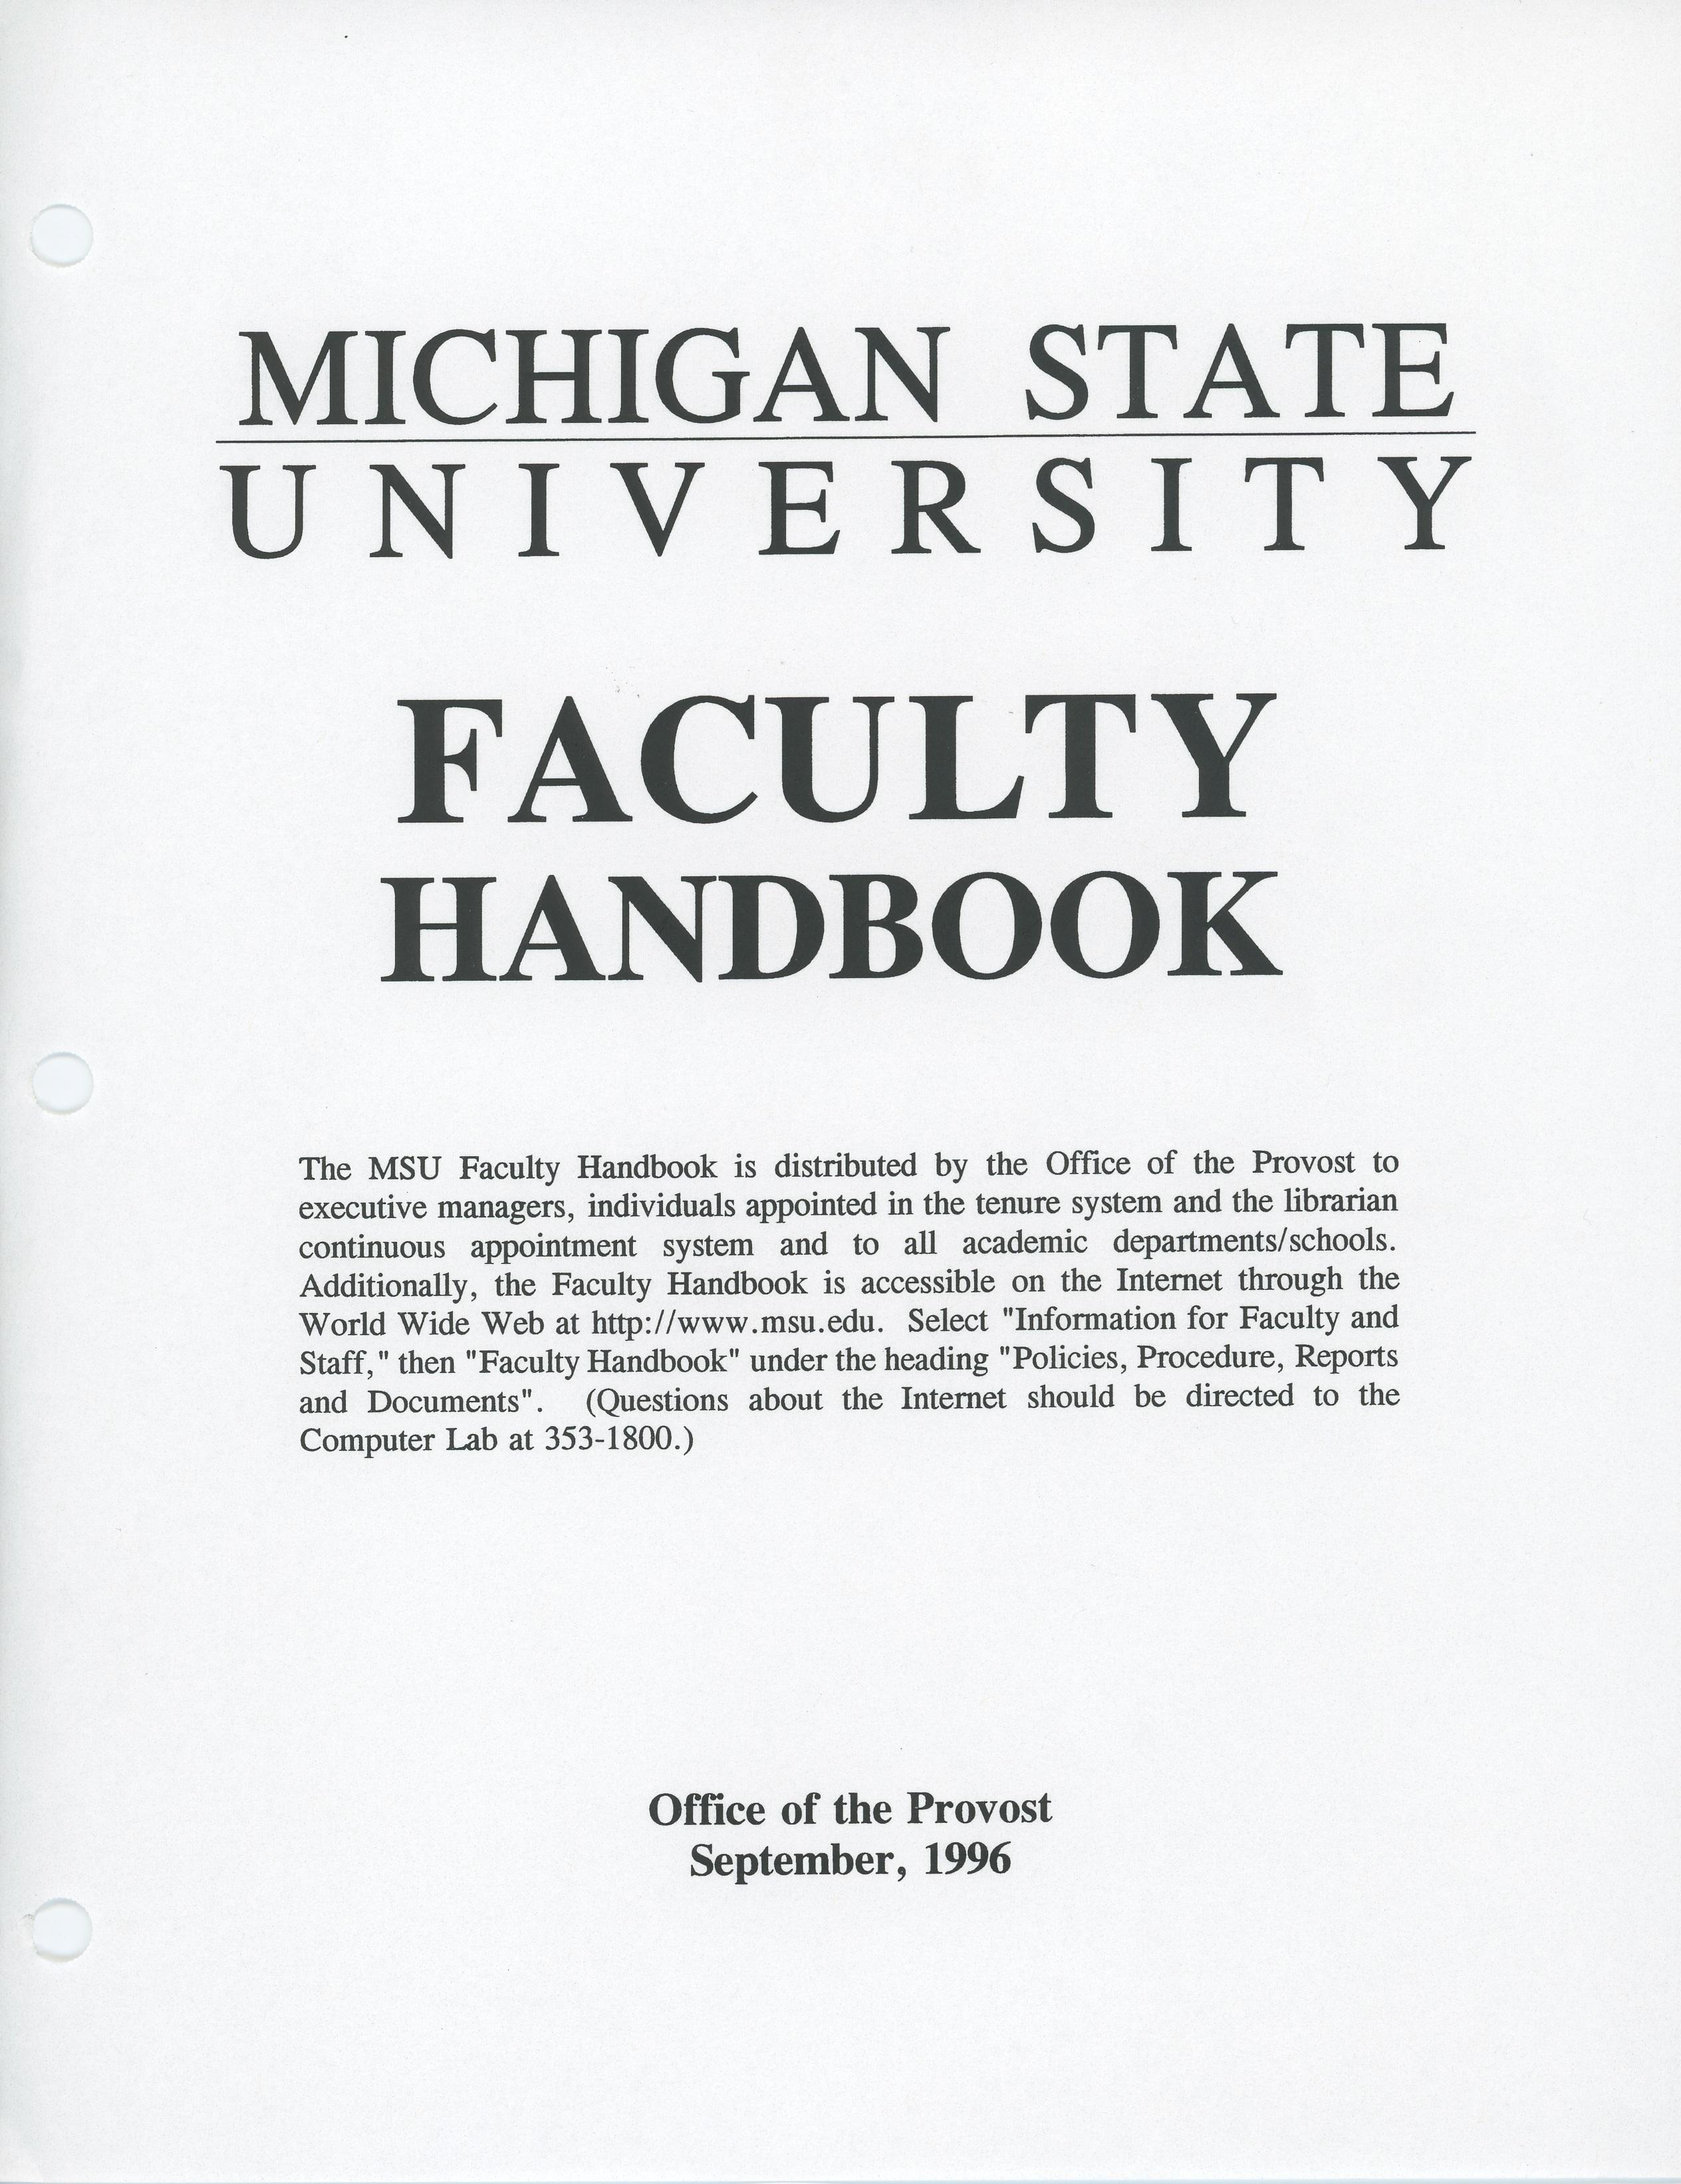 Faculty Handbook, 1996